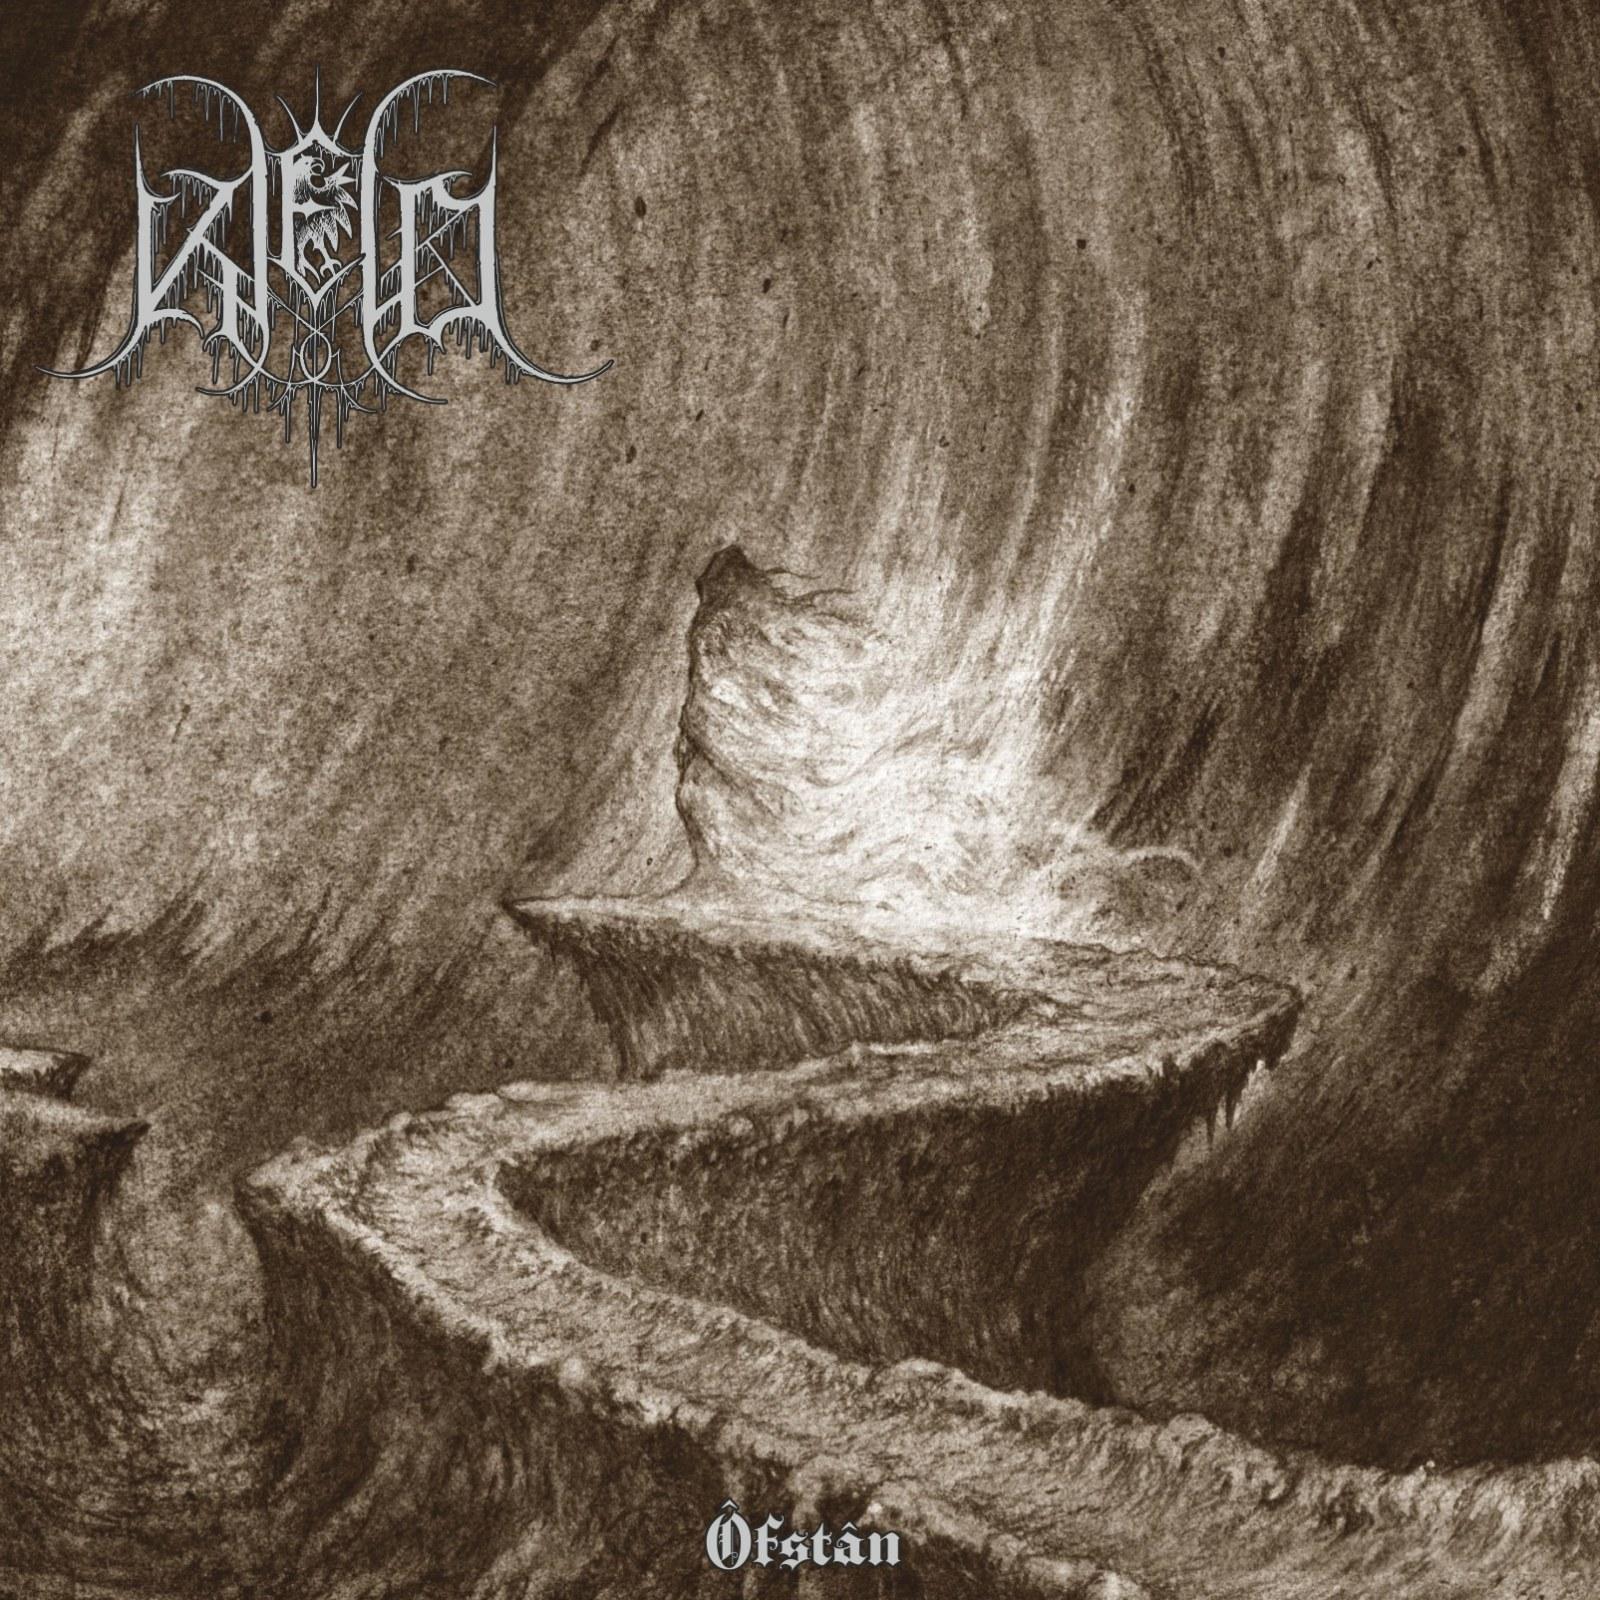 Reviews for Kjeld - Ôfstân